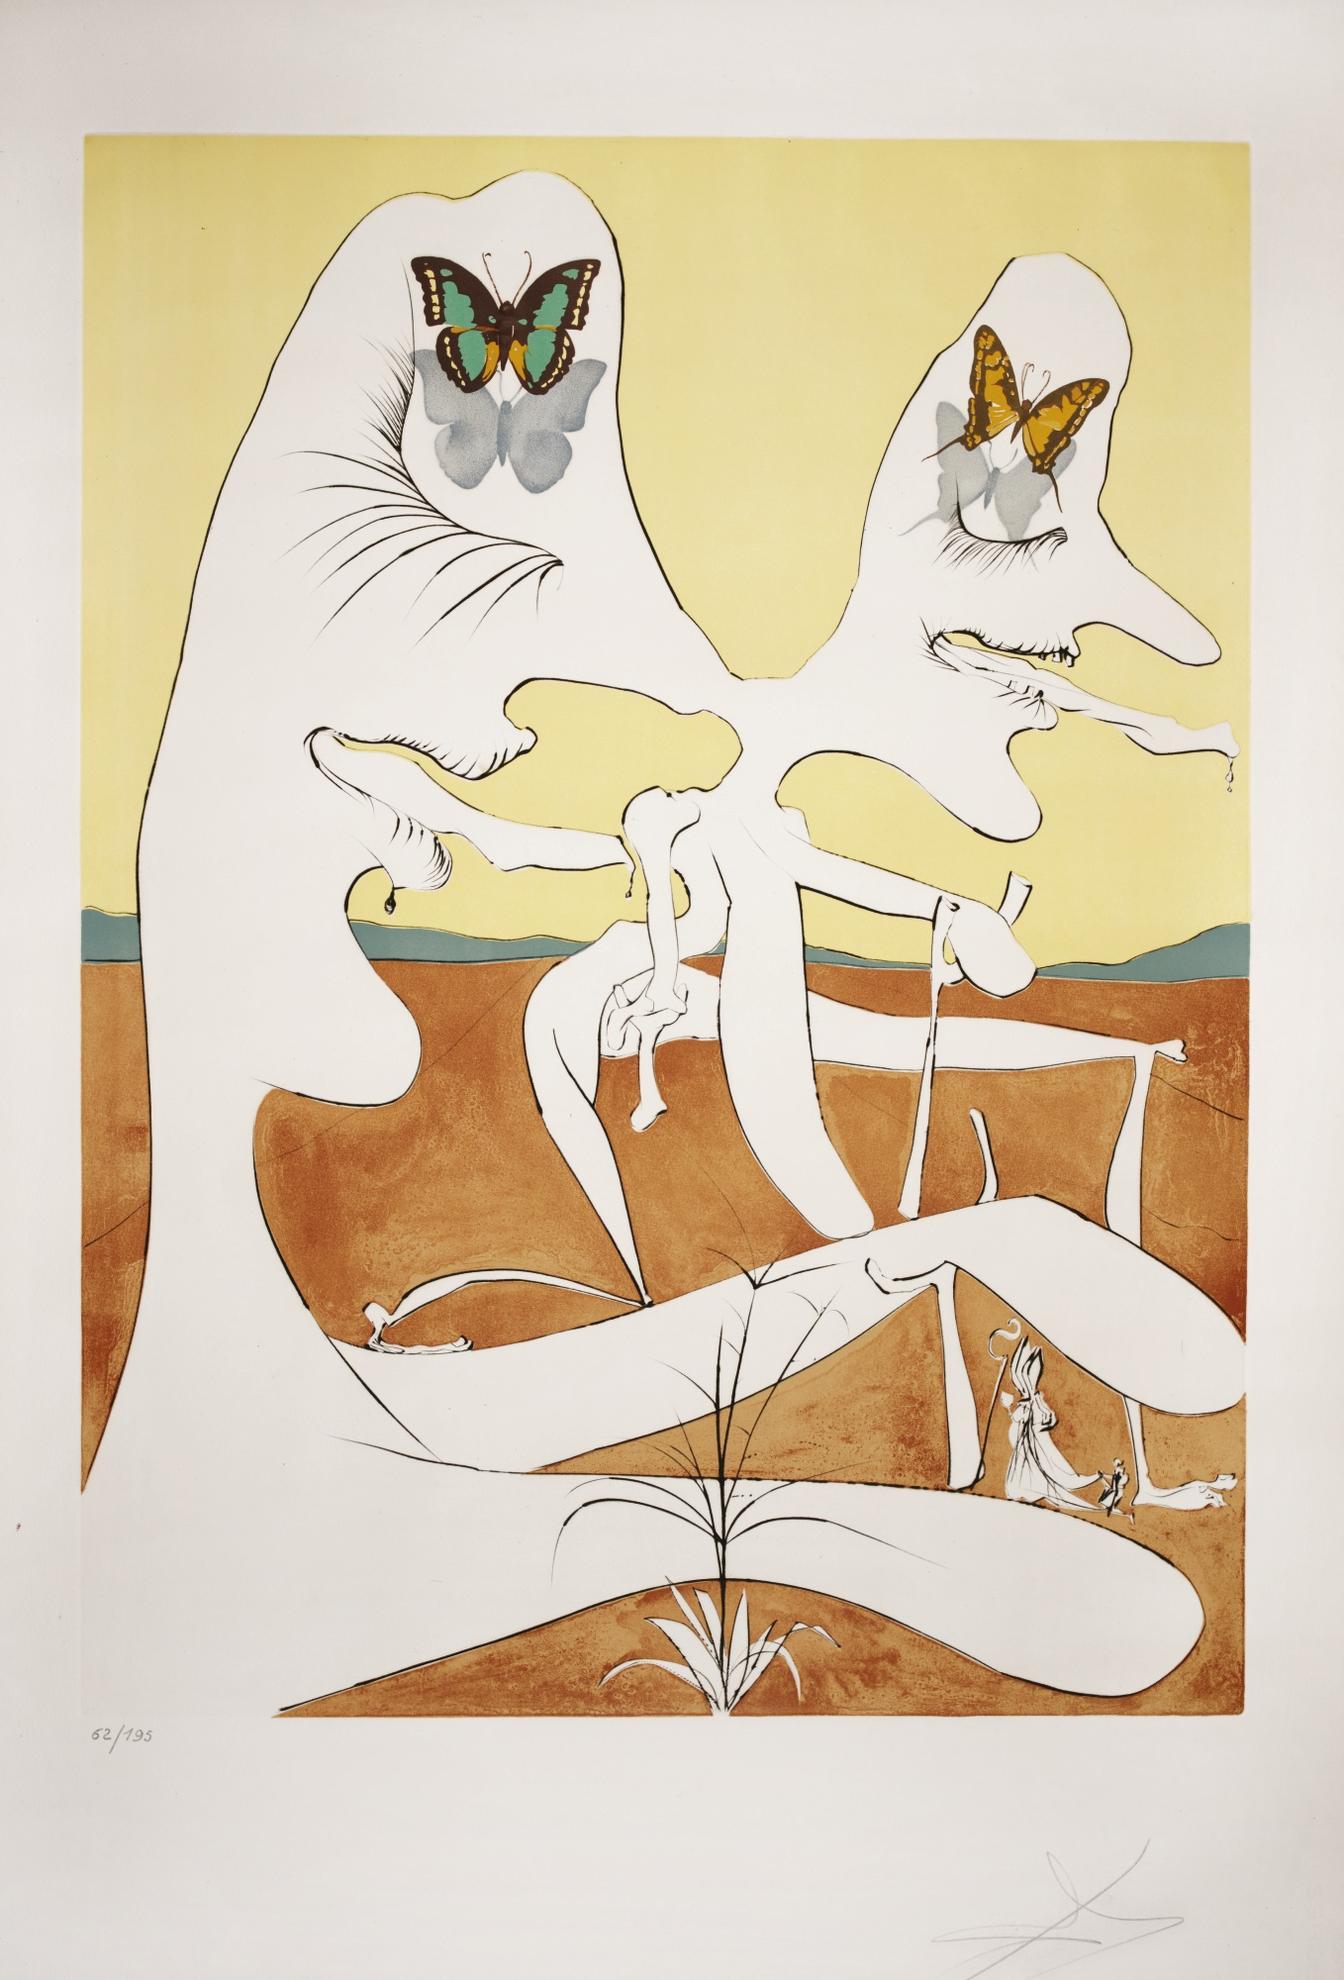 Salvador Dali-La Conquete Du Cosmos (M. & L. 641-652; F. Pp. 98-99)-1974